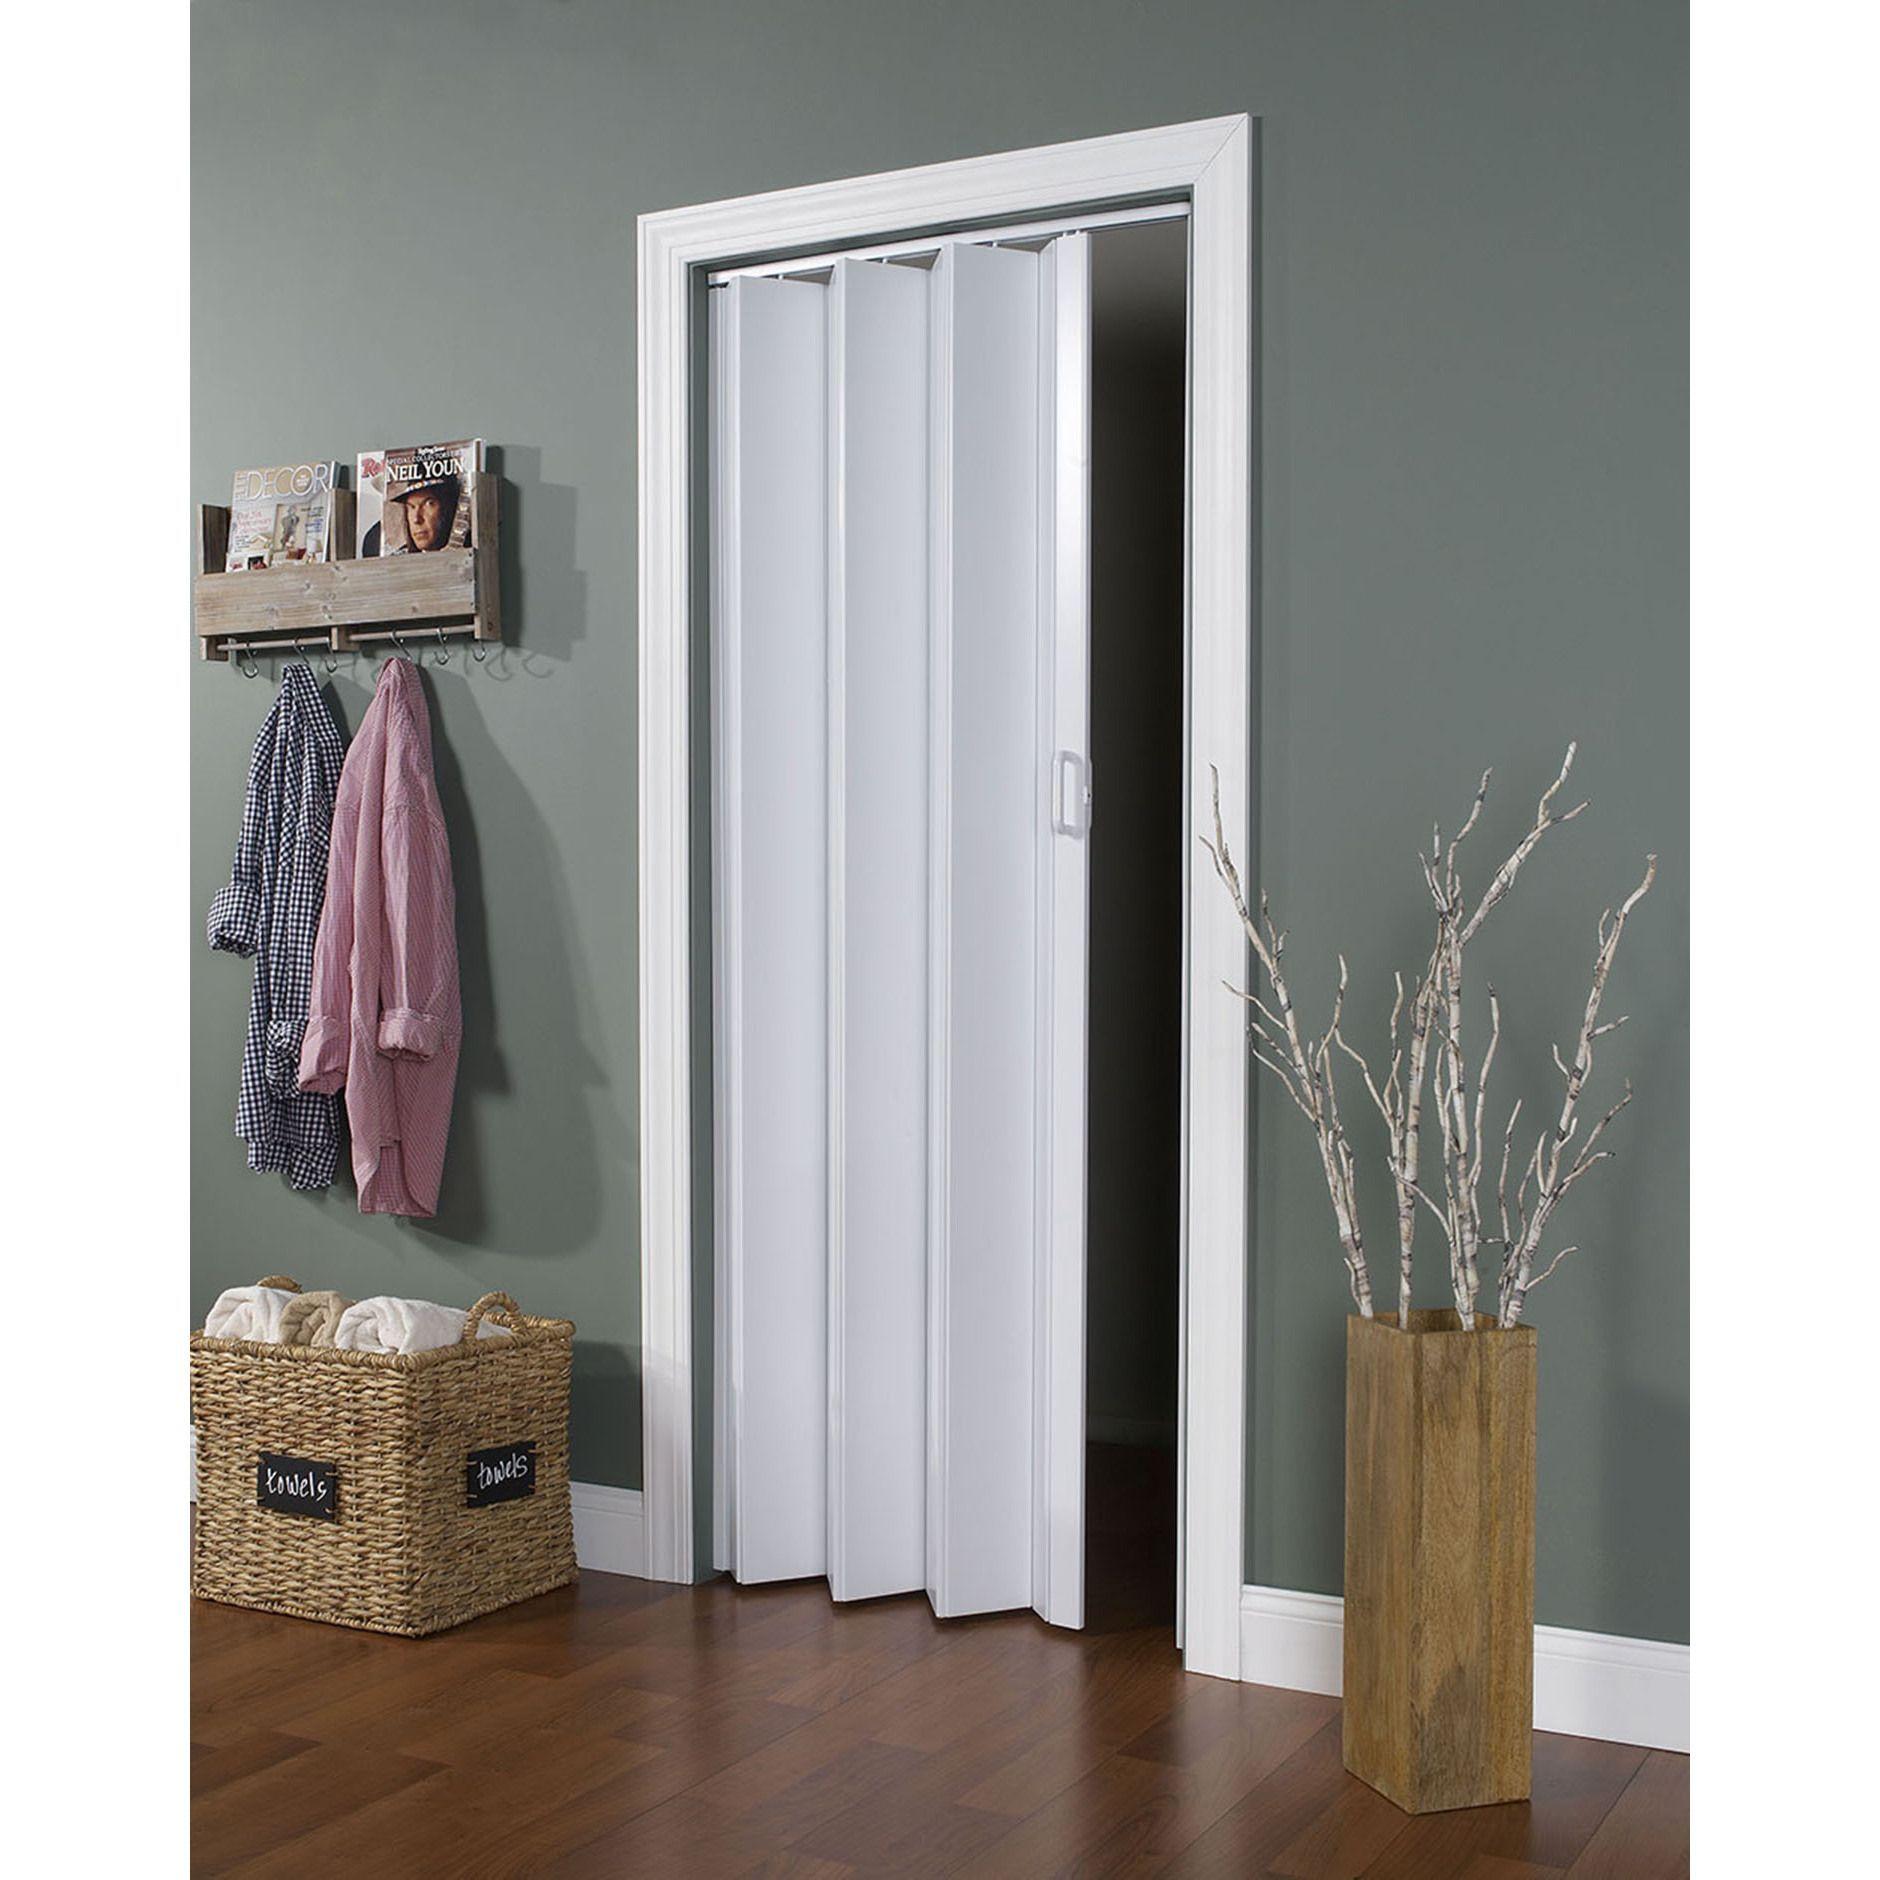 accordion doors or folding doors are quickly gaining popularity in spectrum encore white folding door white size 36x80